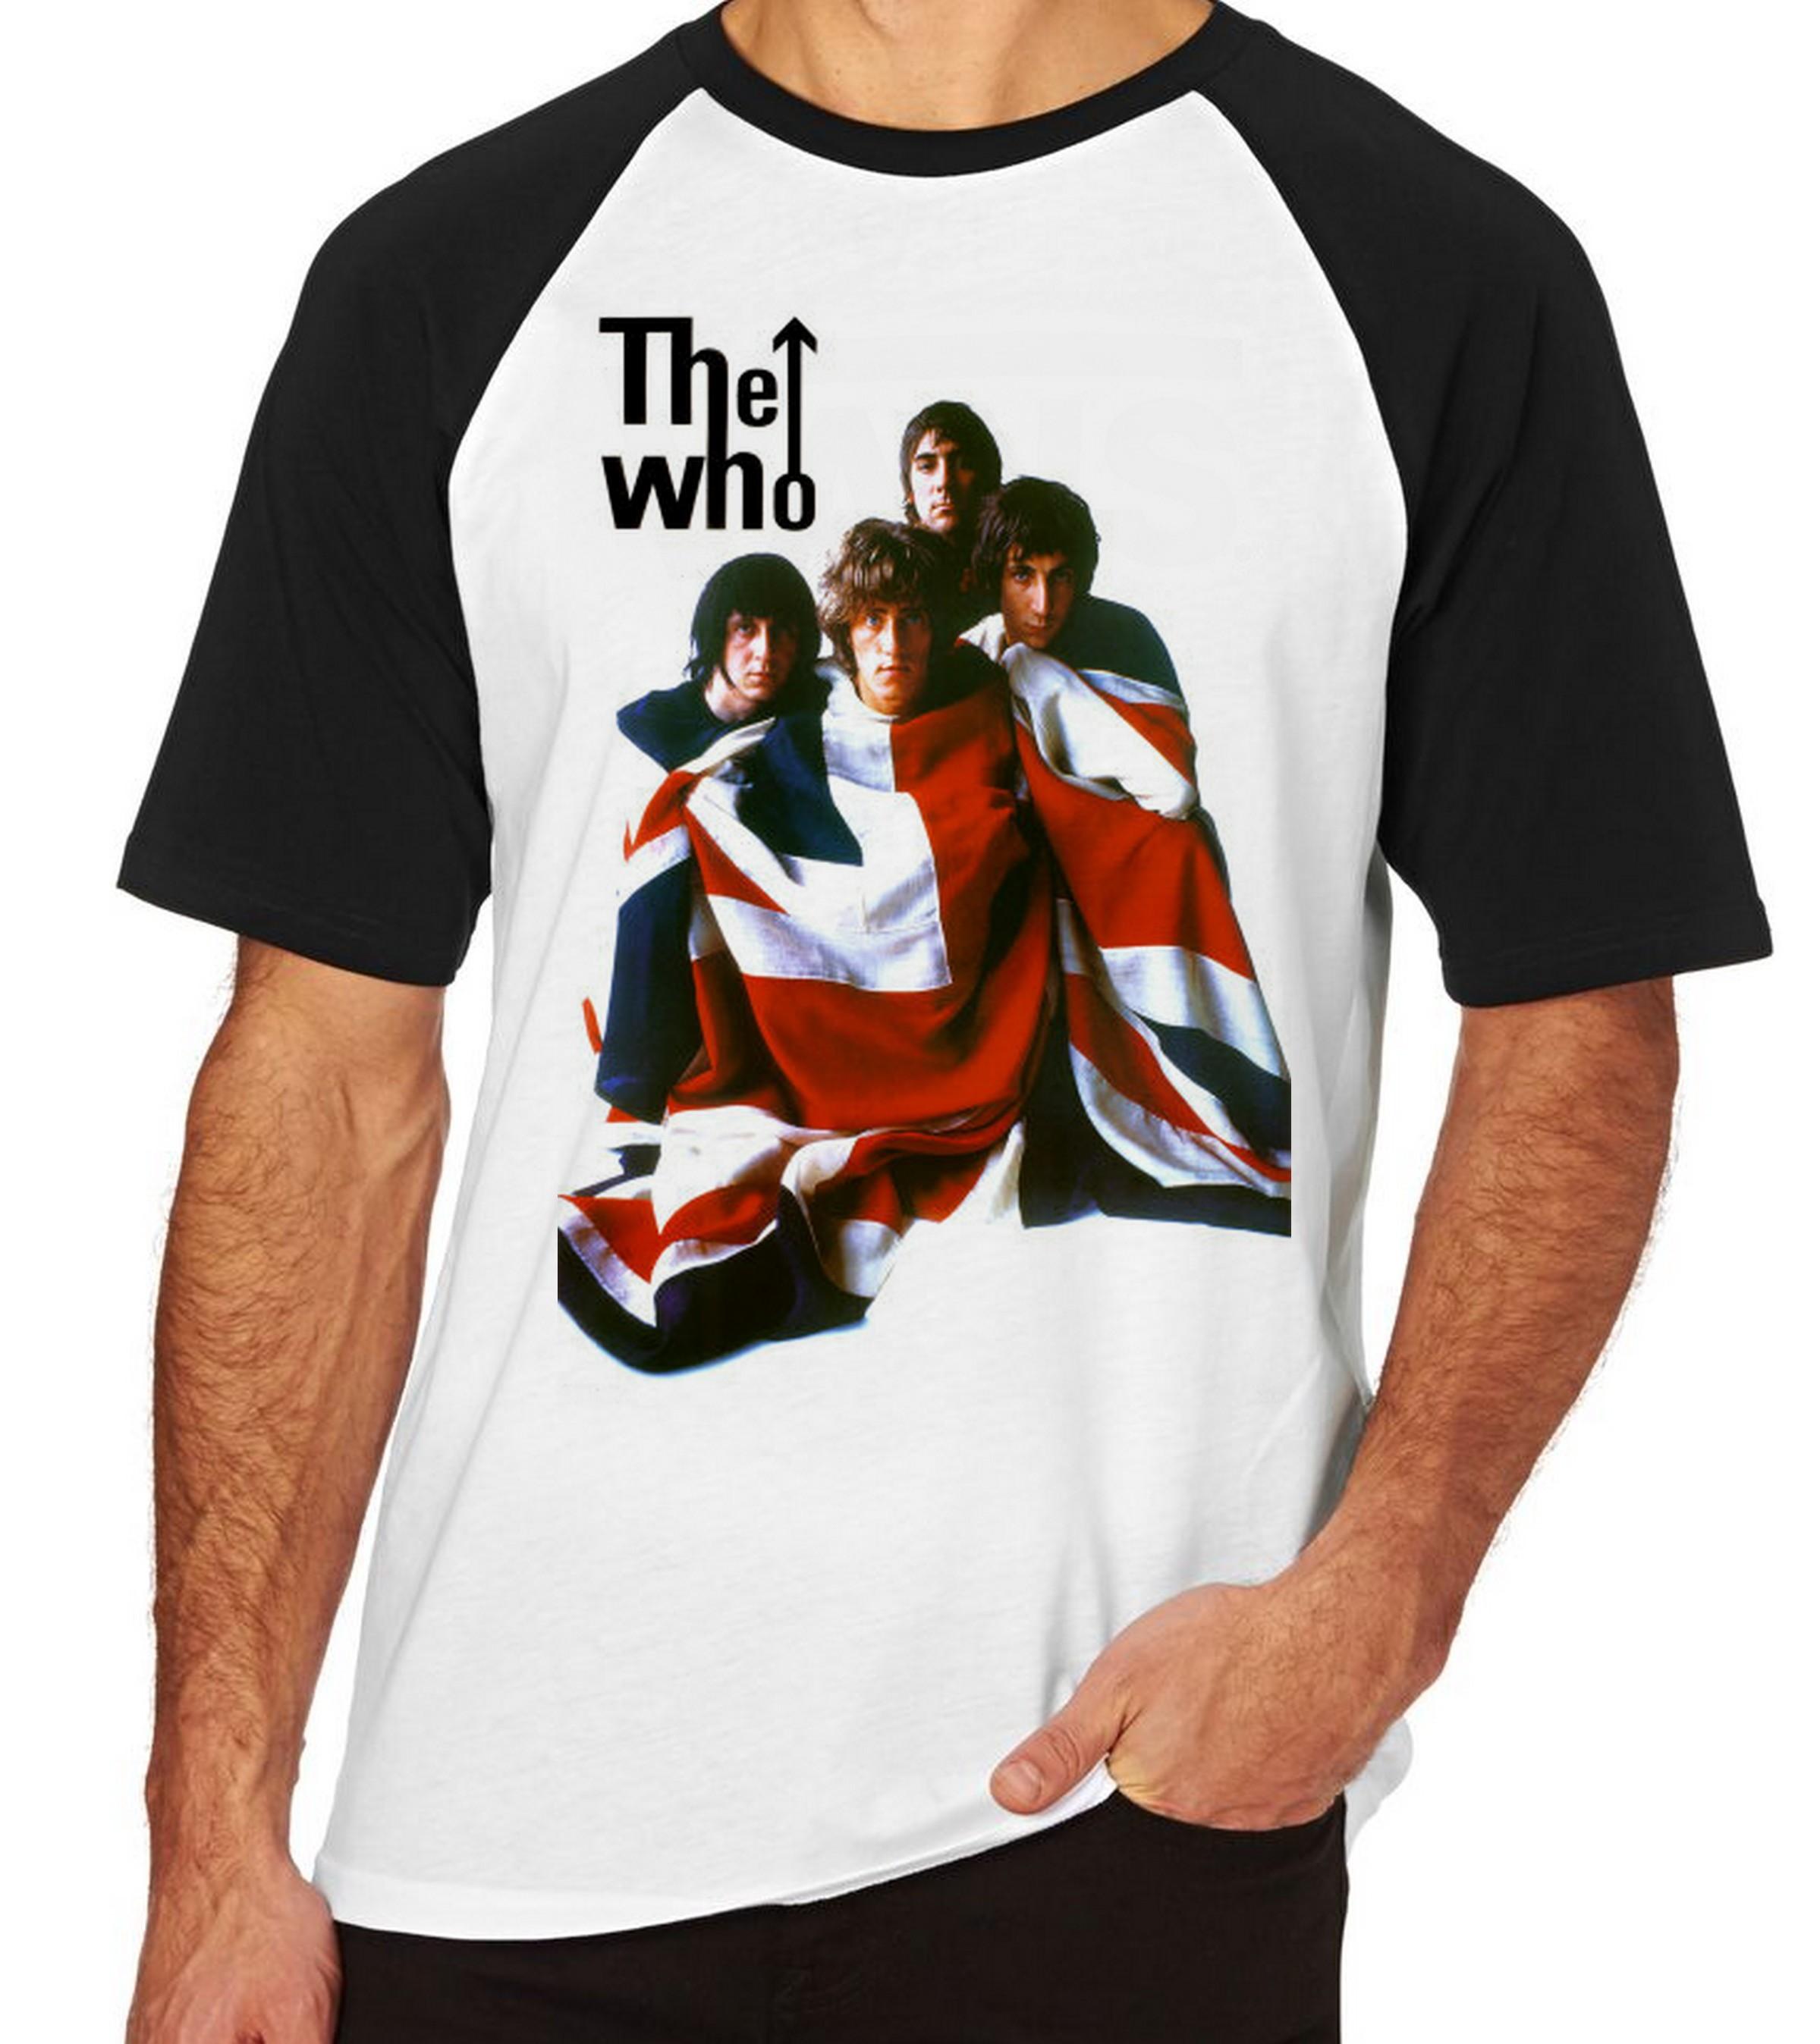 Camiseta Infantil Blusa Crianca The Who Banda Inglesa Rock  9498edee30e54